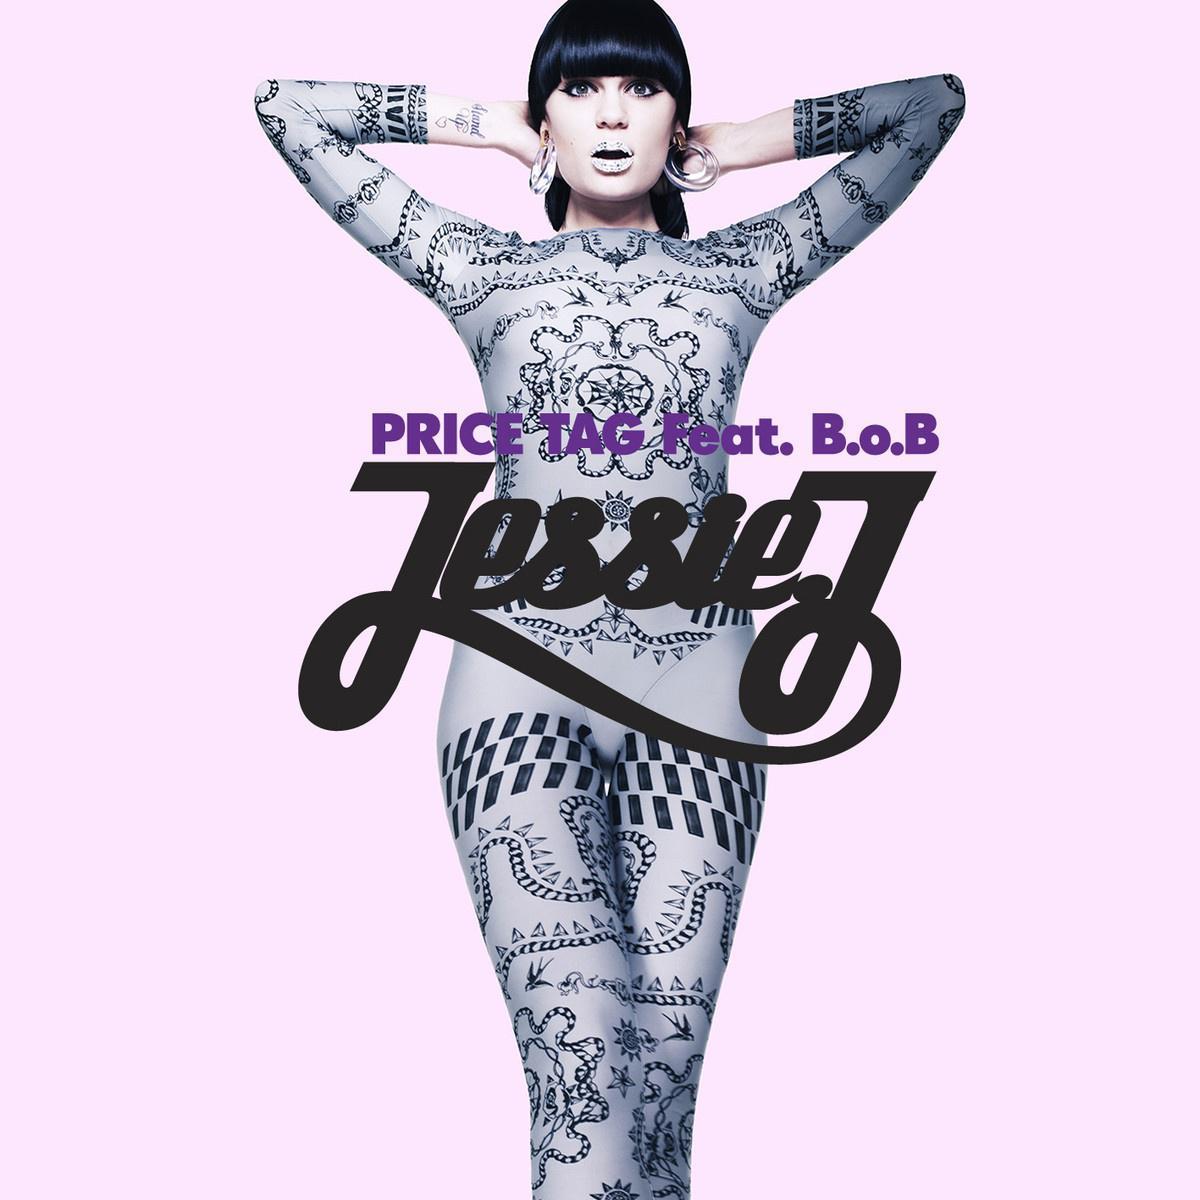 price tag歌曲在线试听_jessie j price tag歌词_沪江